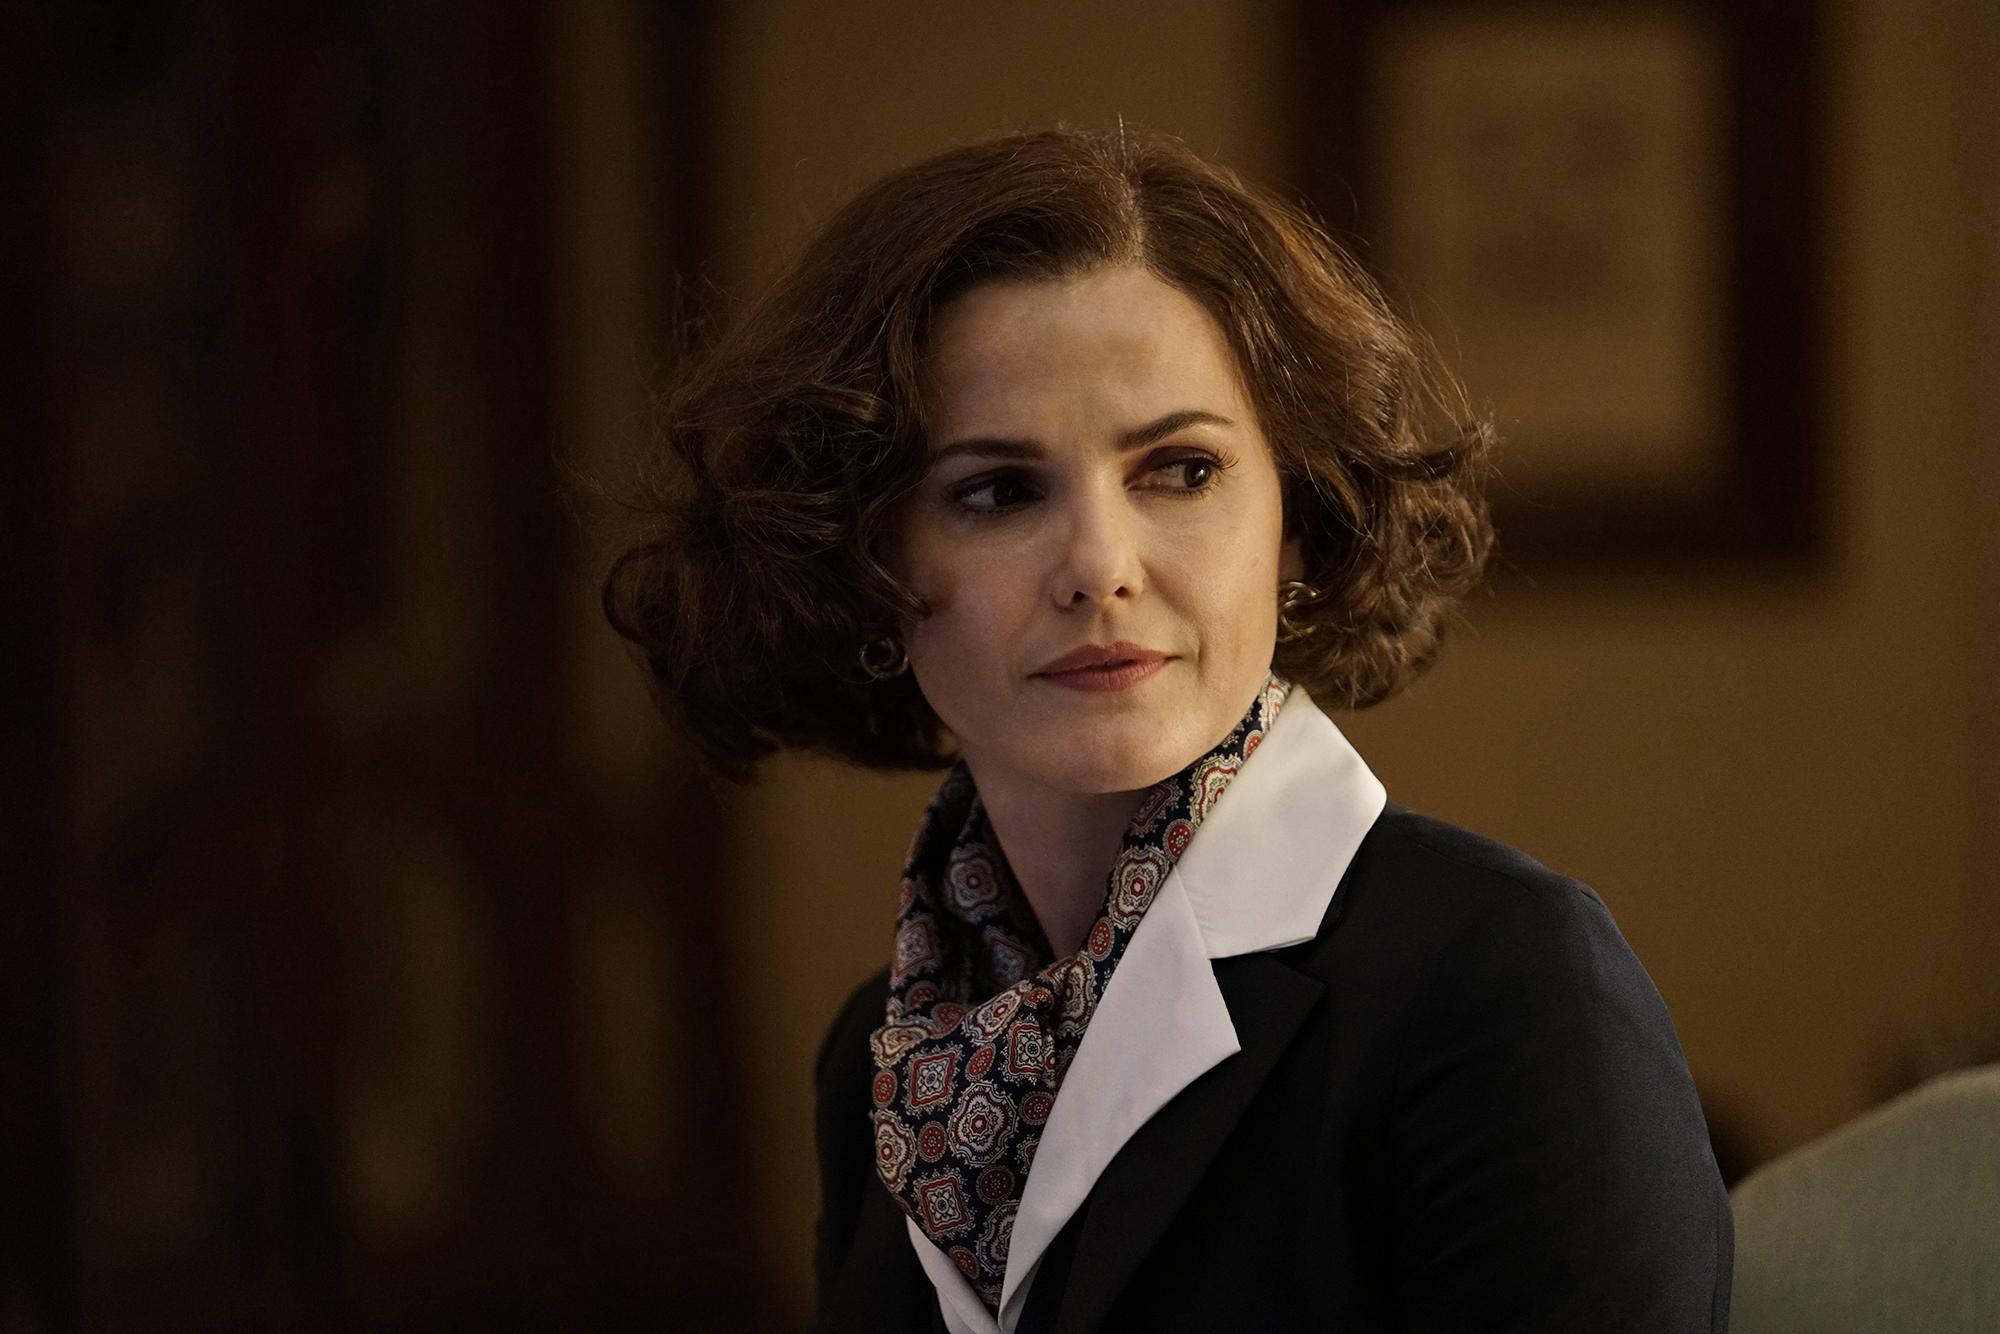 Keri Russell as Elizabeth Jennings in Season 5 of The Americans.